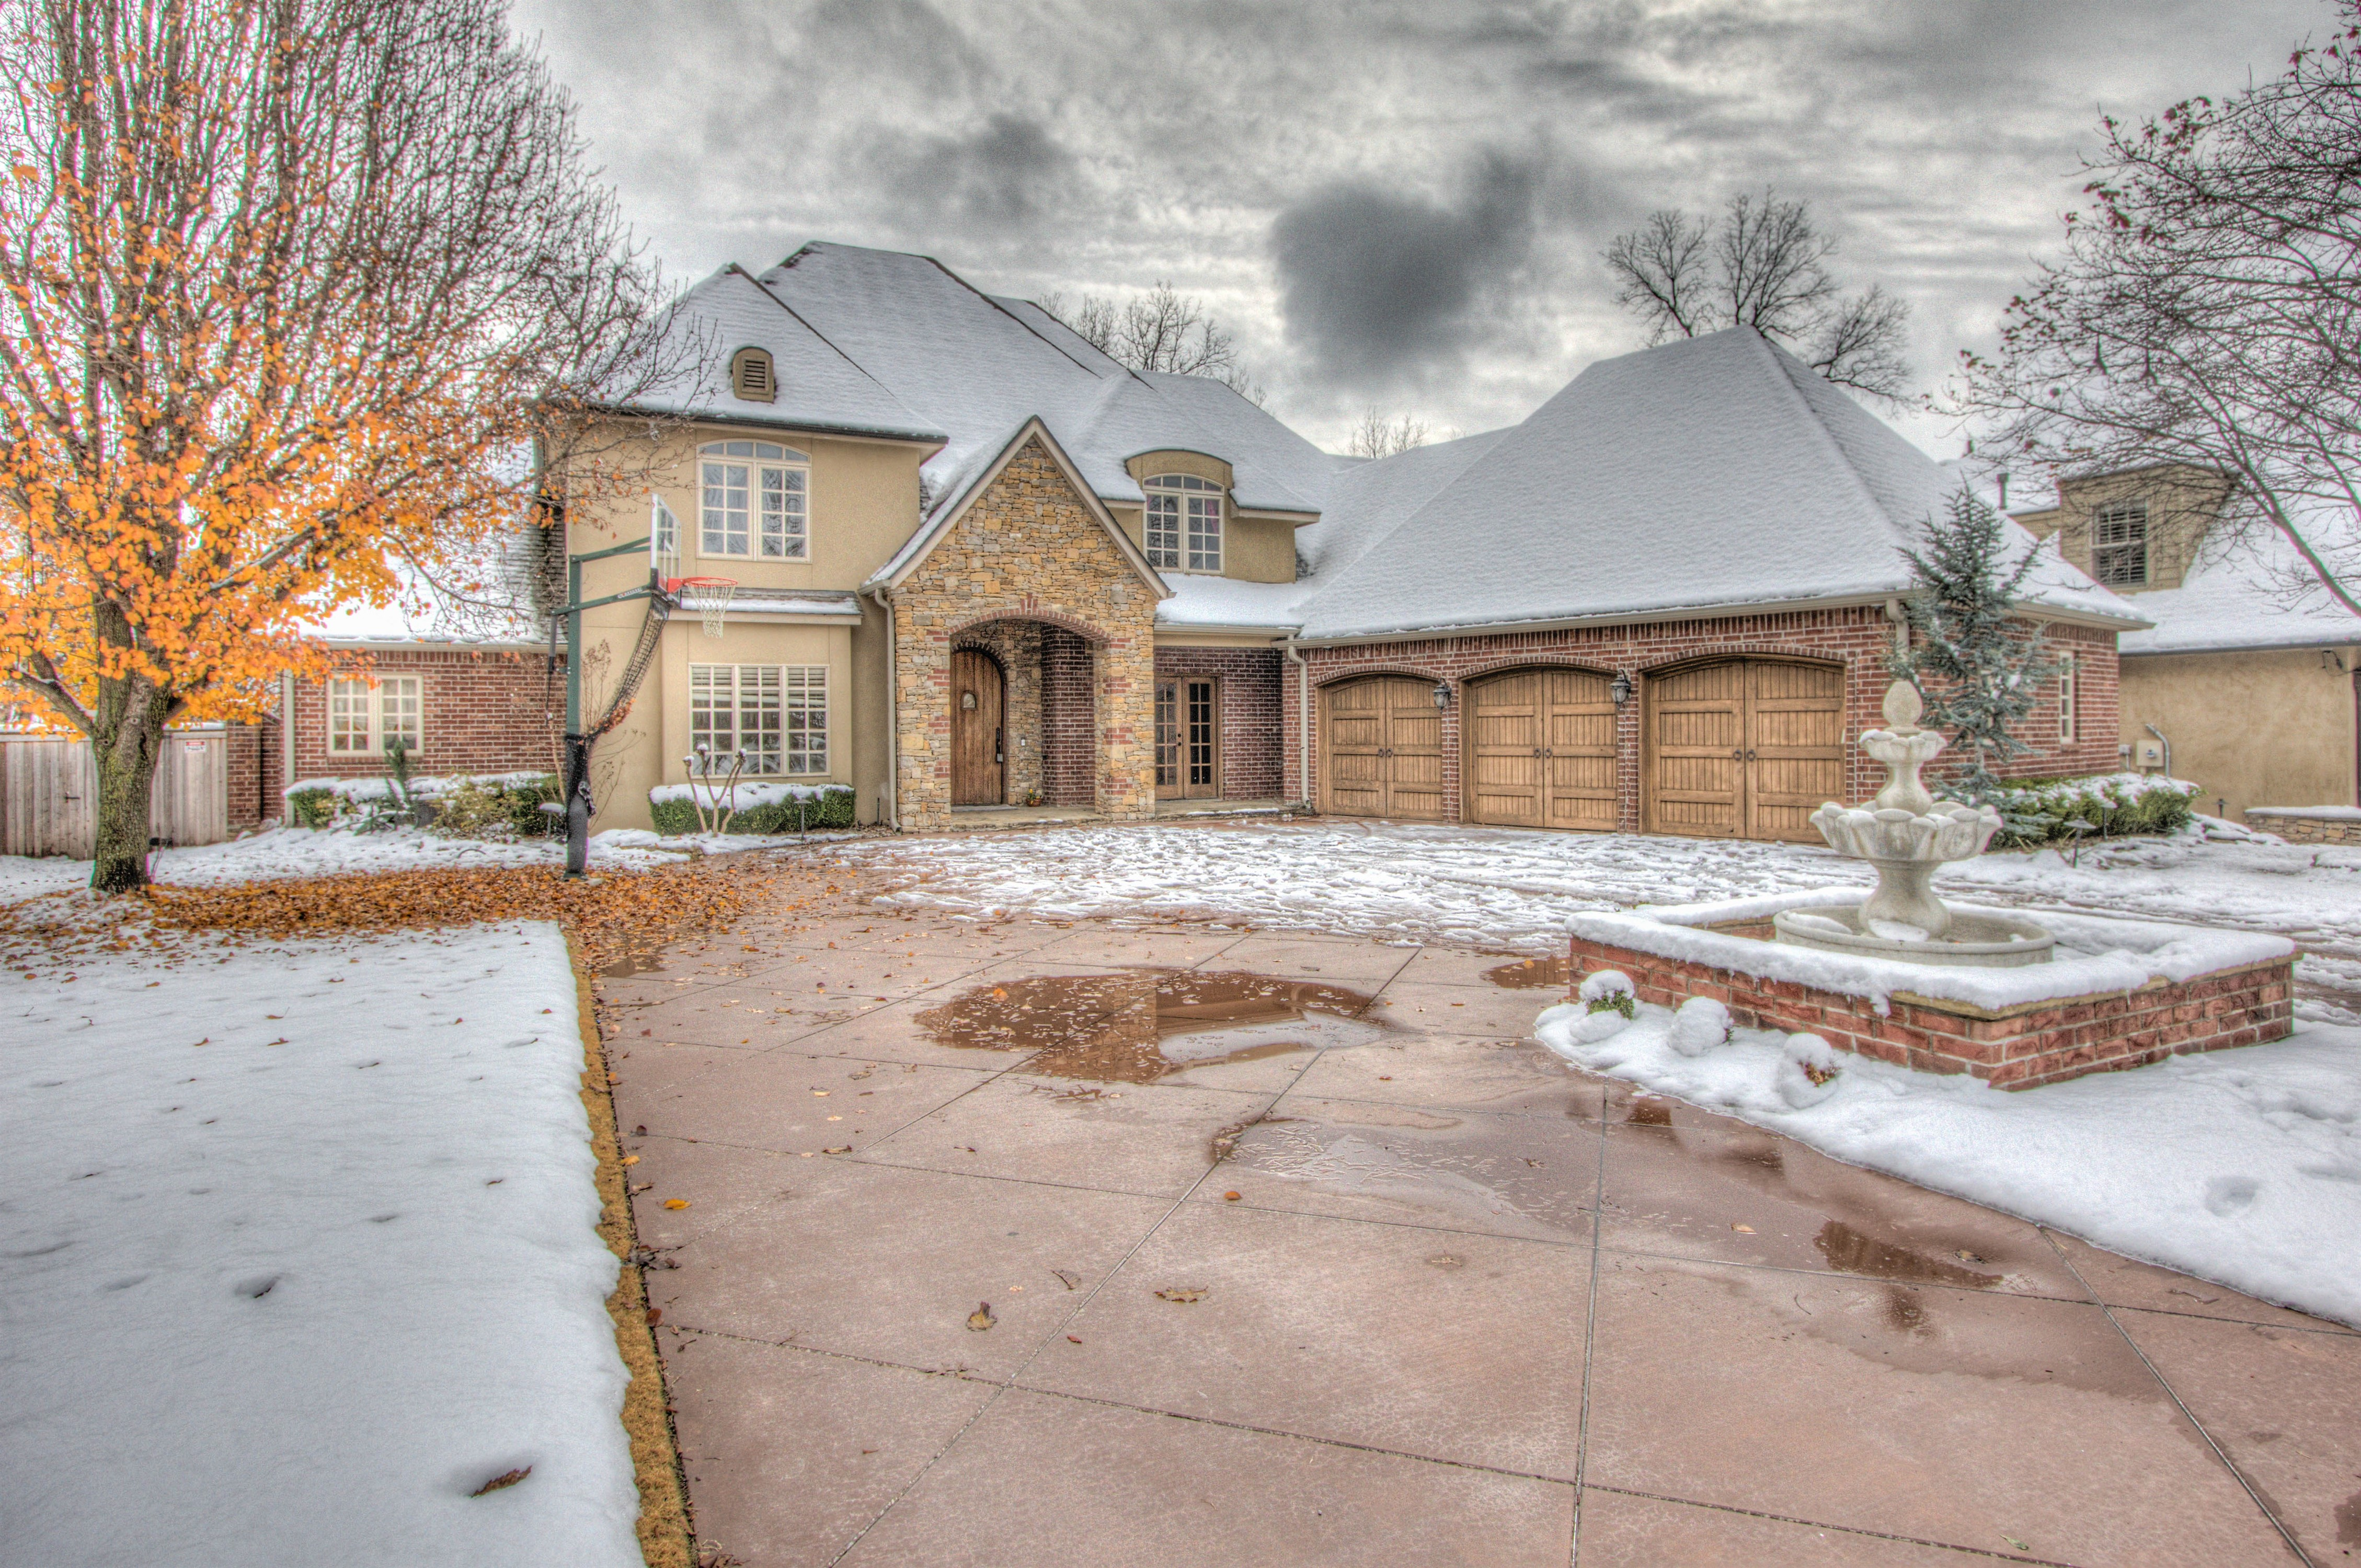 10625 S 91st East Avenue Property Photo 1